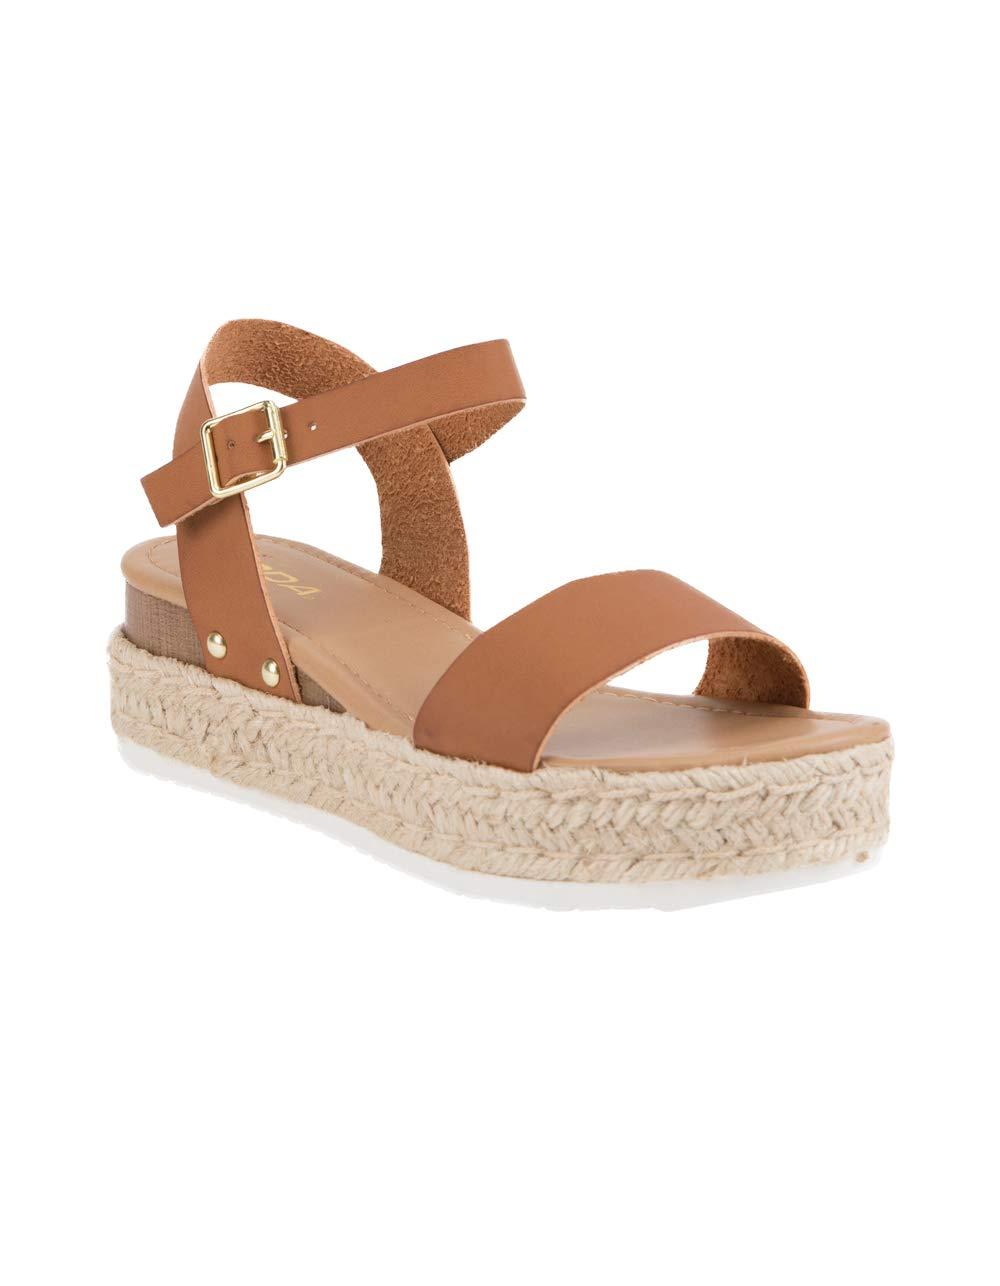 SODA Clip Tan Espadrille Flatform Sandals, Tan, 5.5